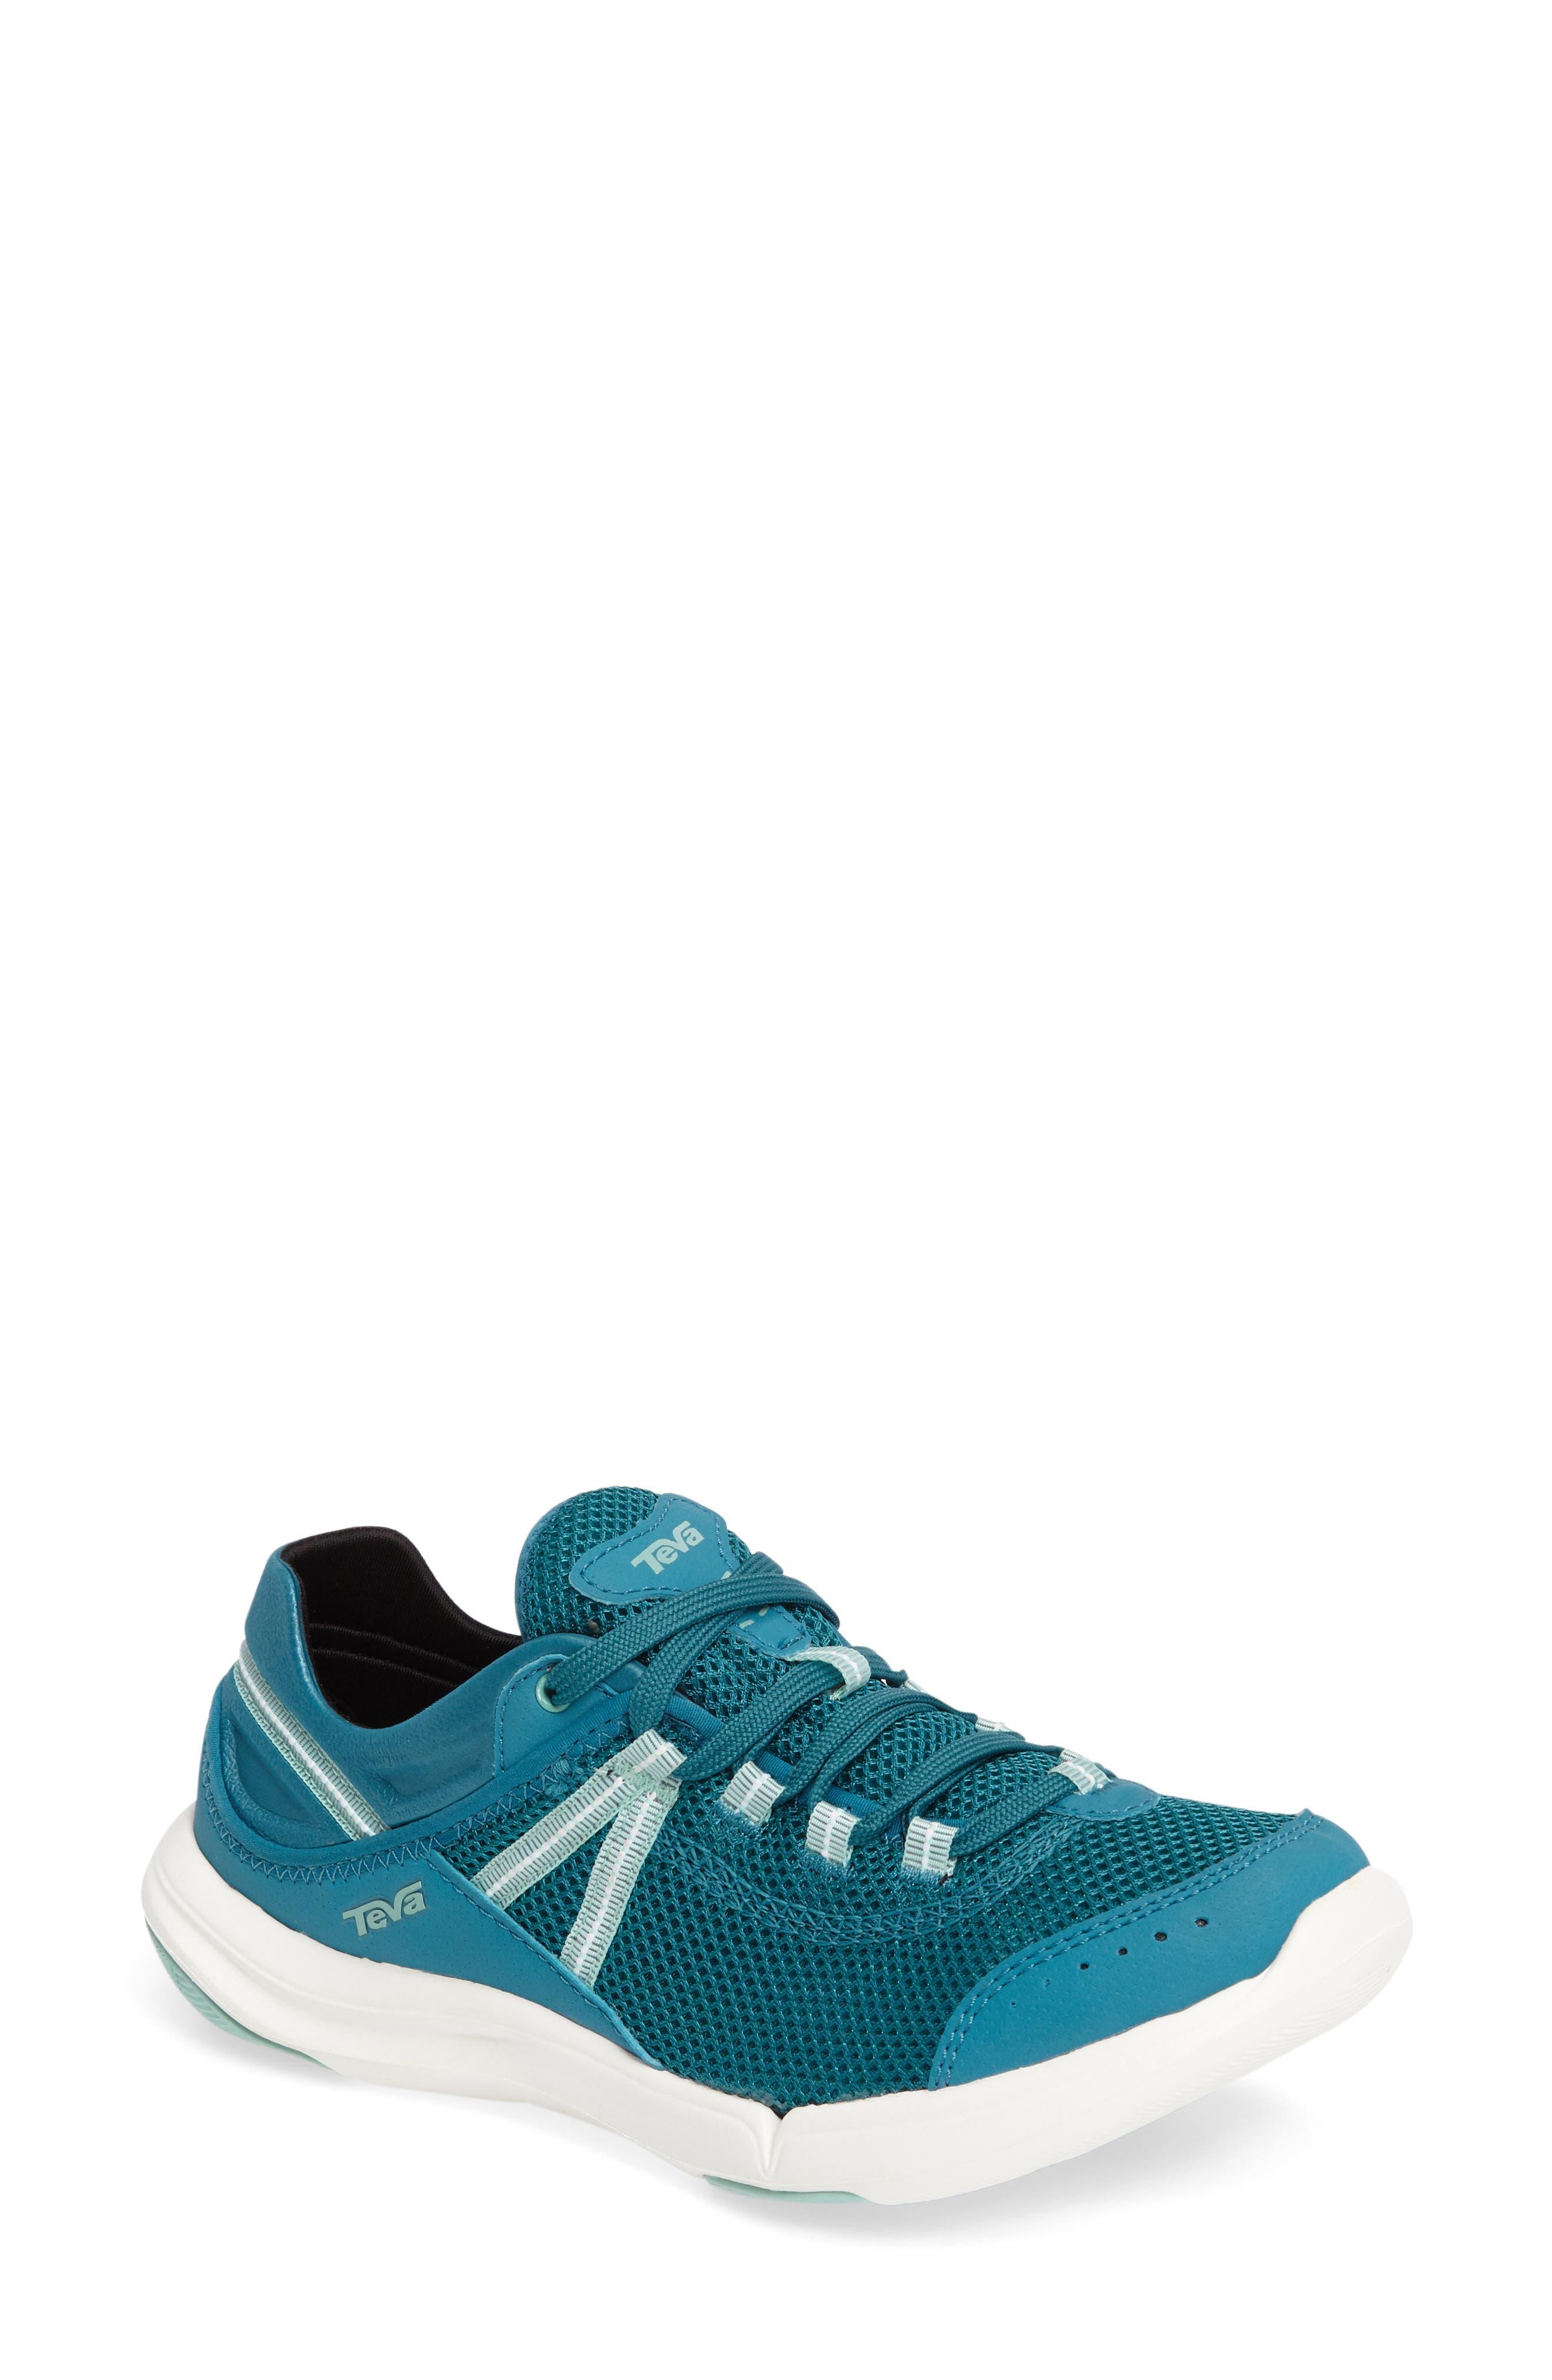 Evo Sneaker,                             Main thumbnail 1, color,                             405